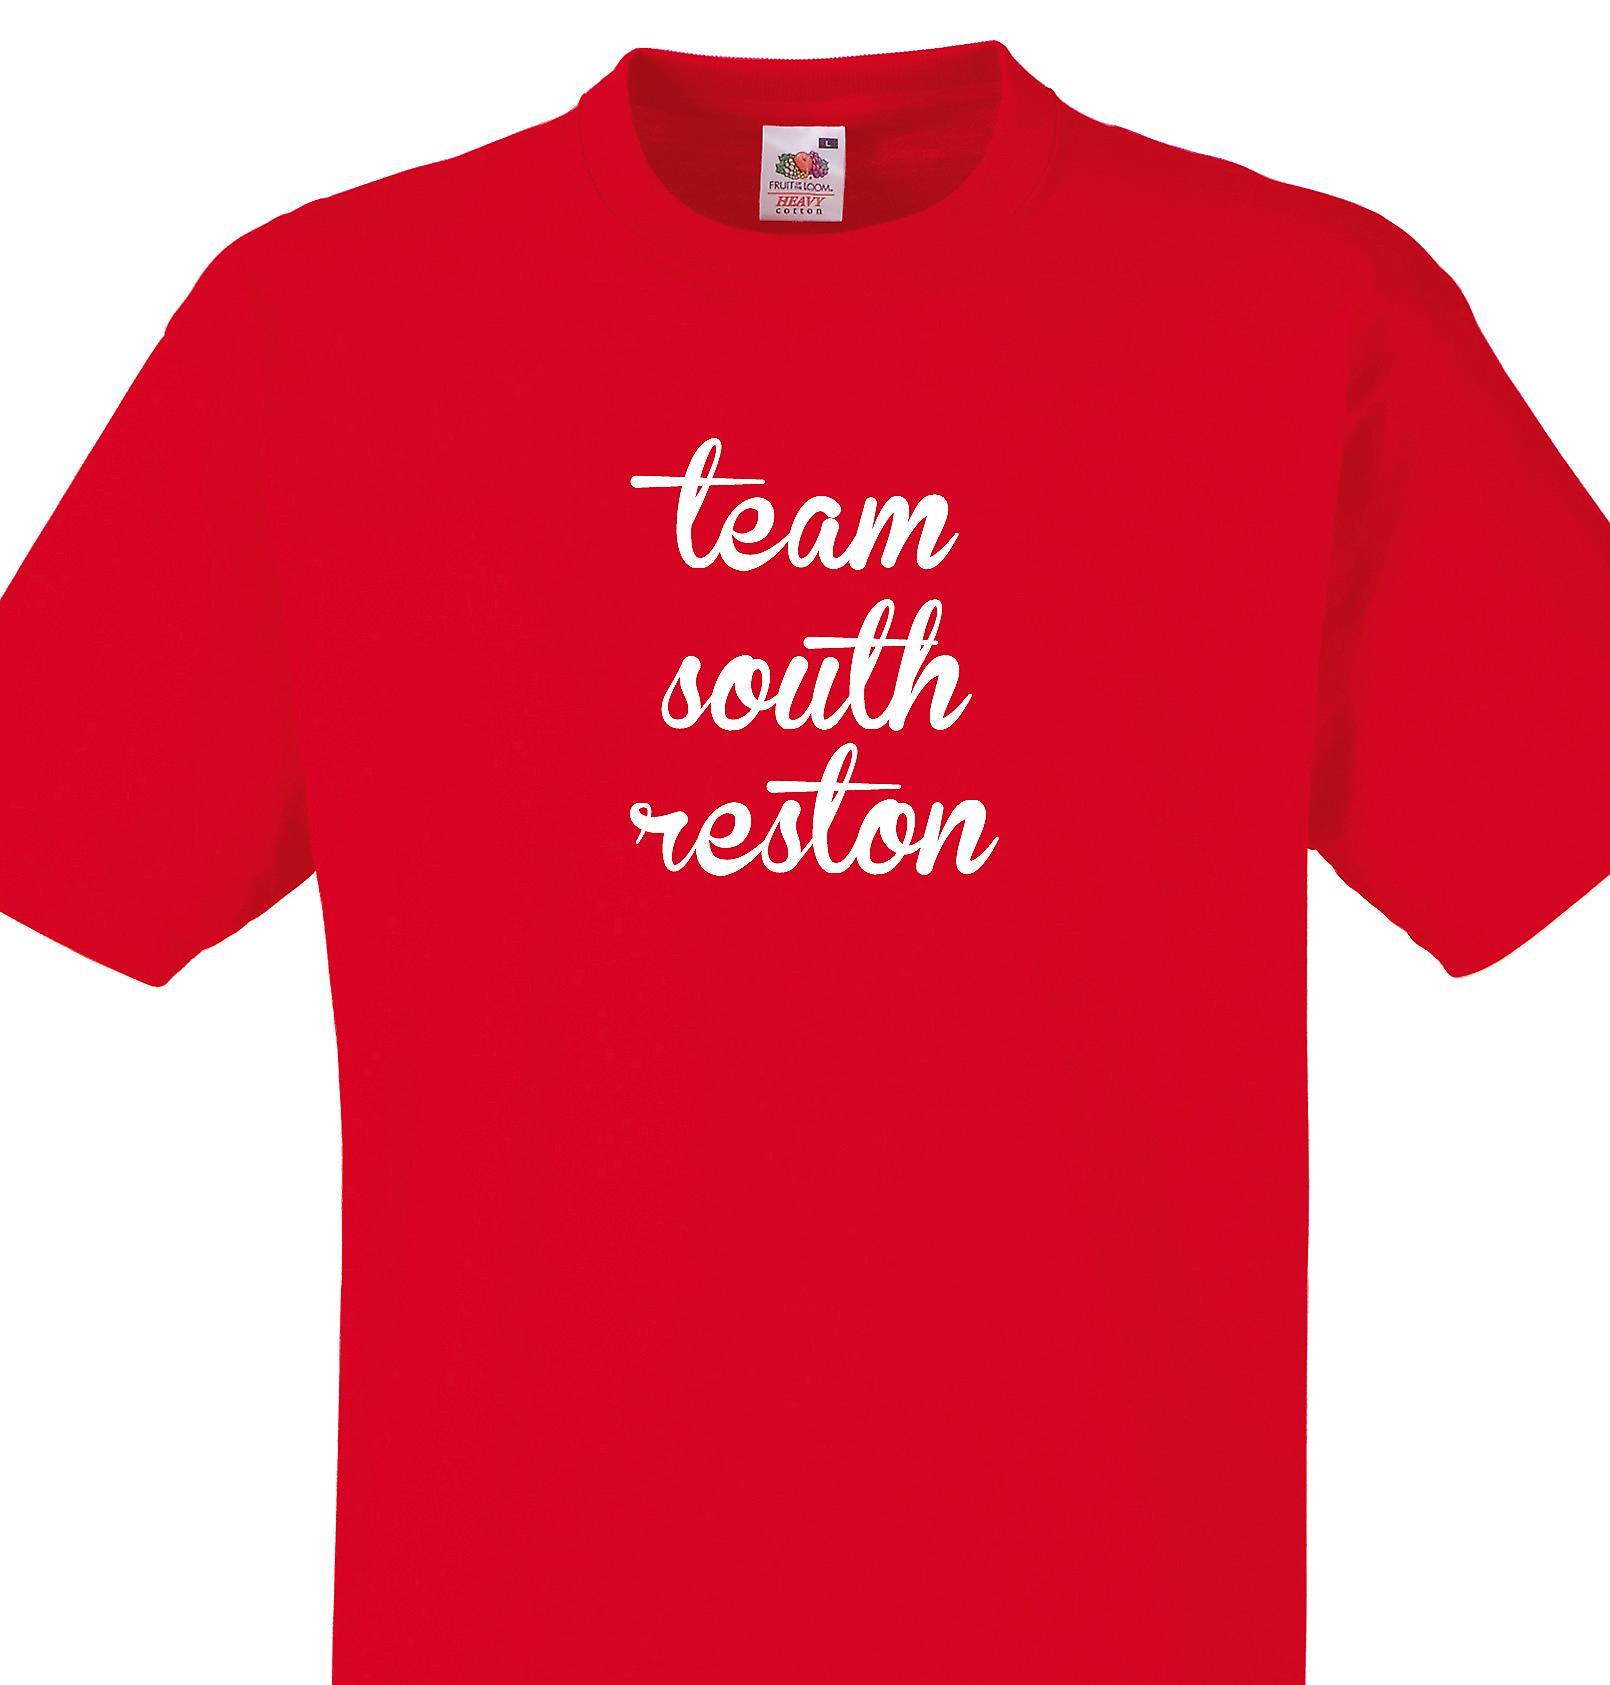 Team South reston Red T shirt